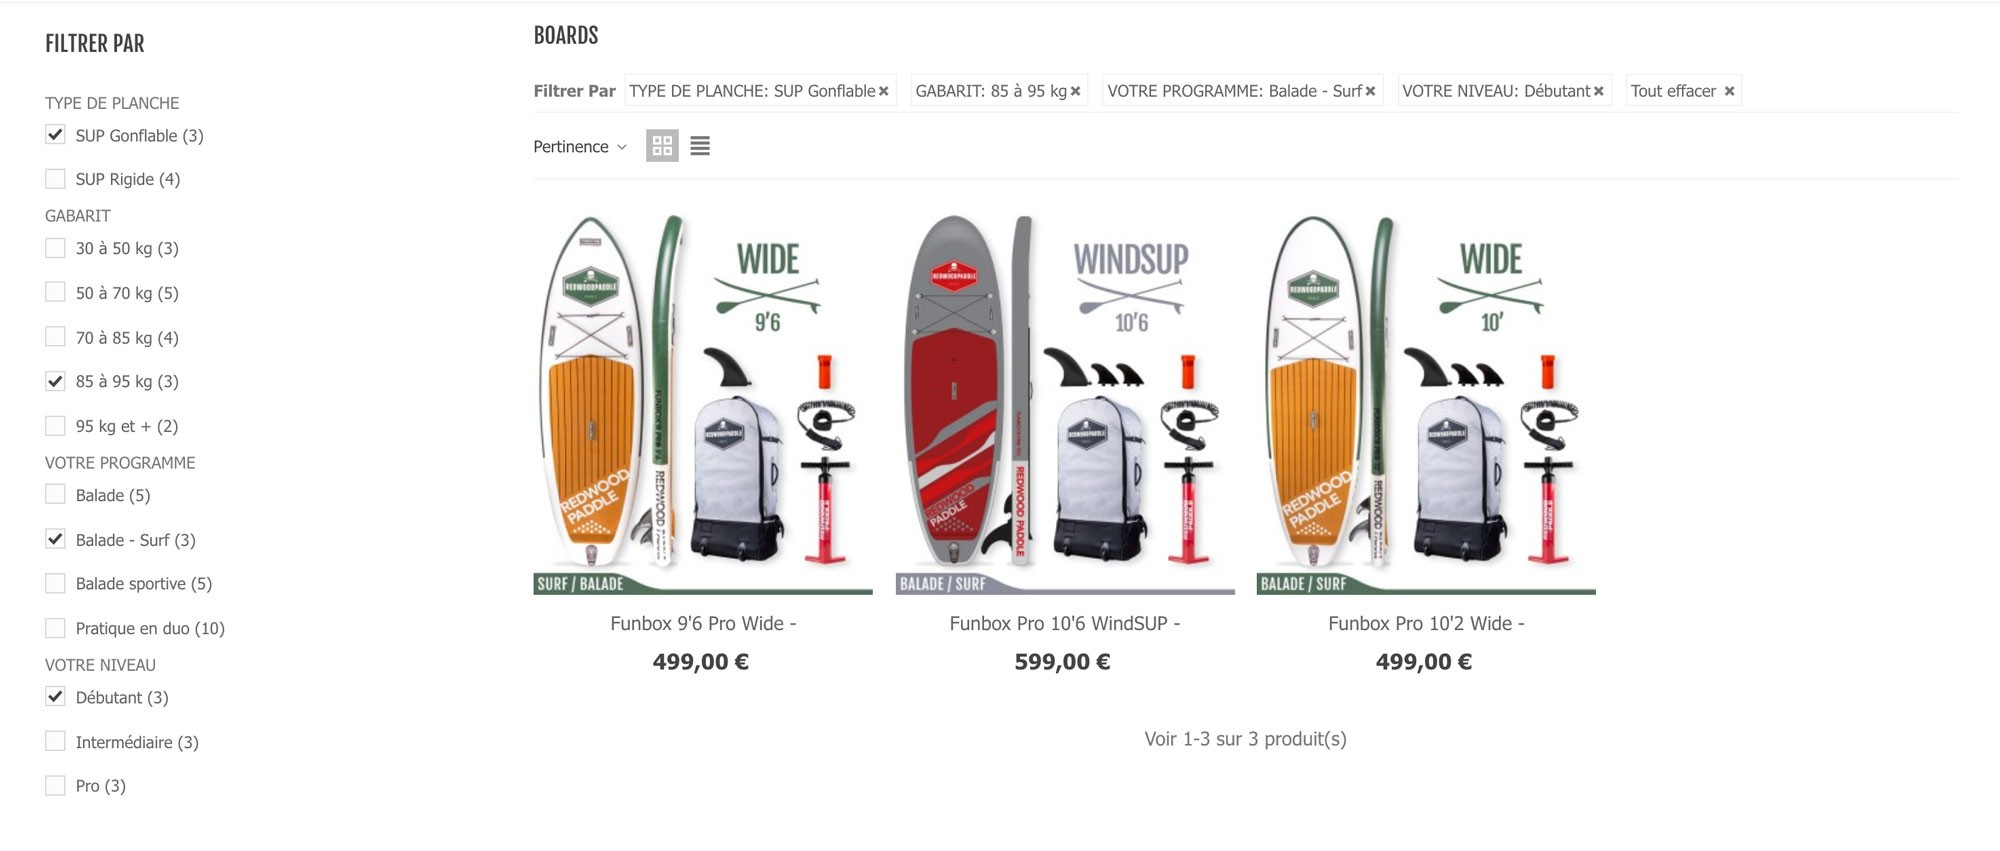 boards choice